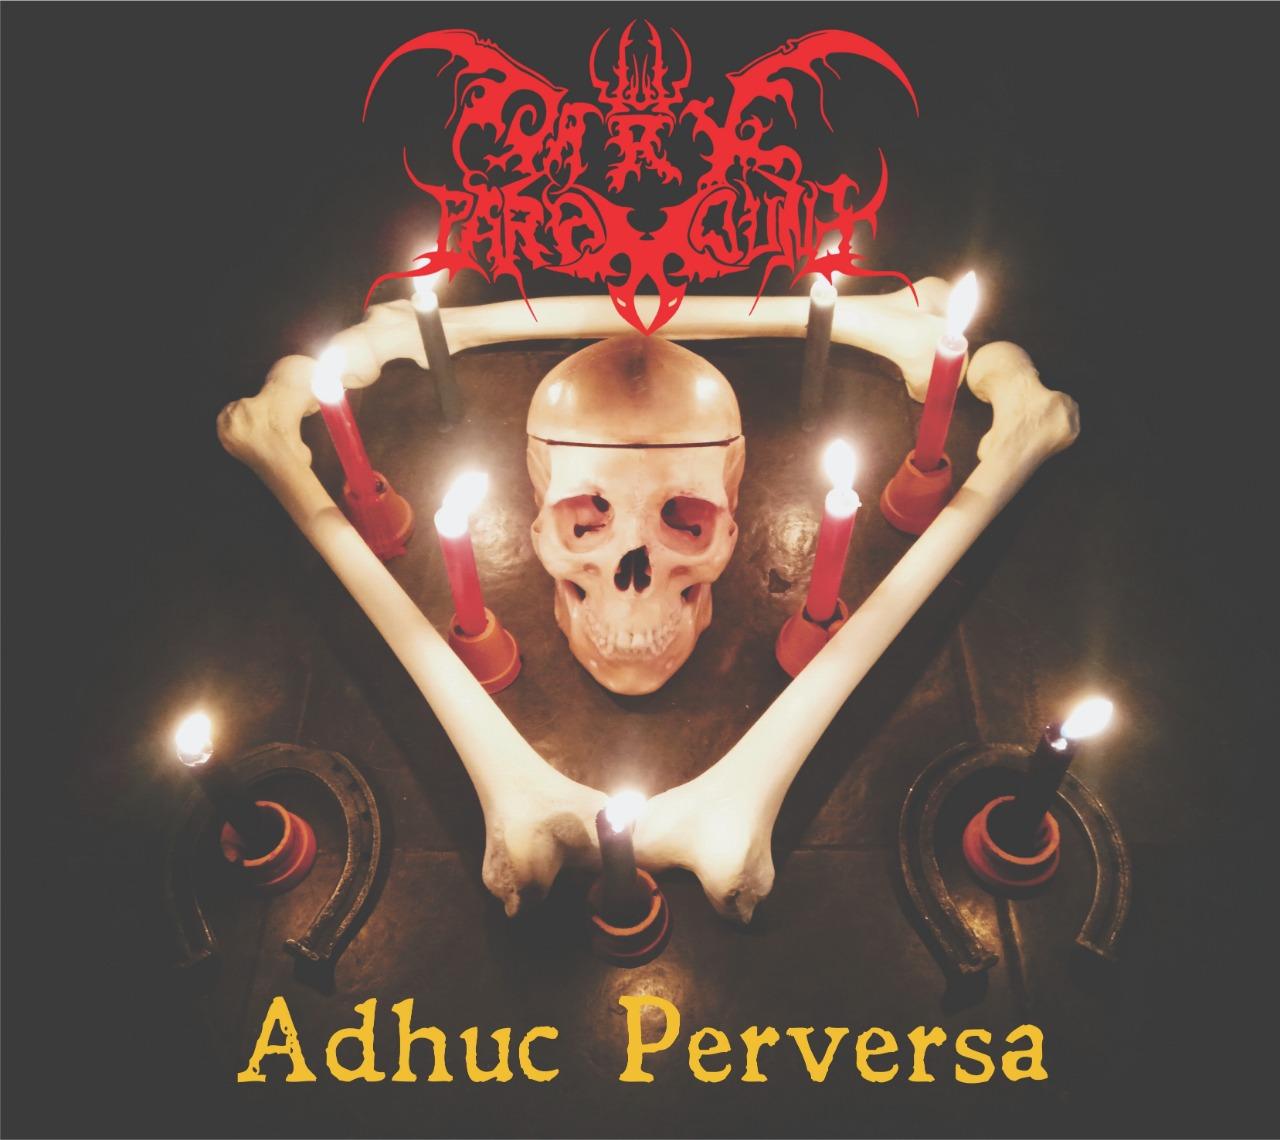 Dark Paramount - Adhuc Perversa